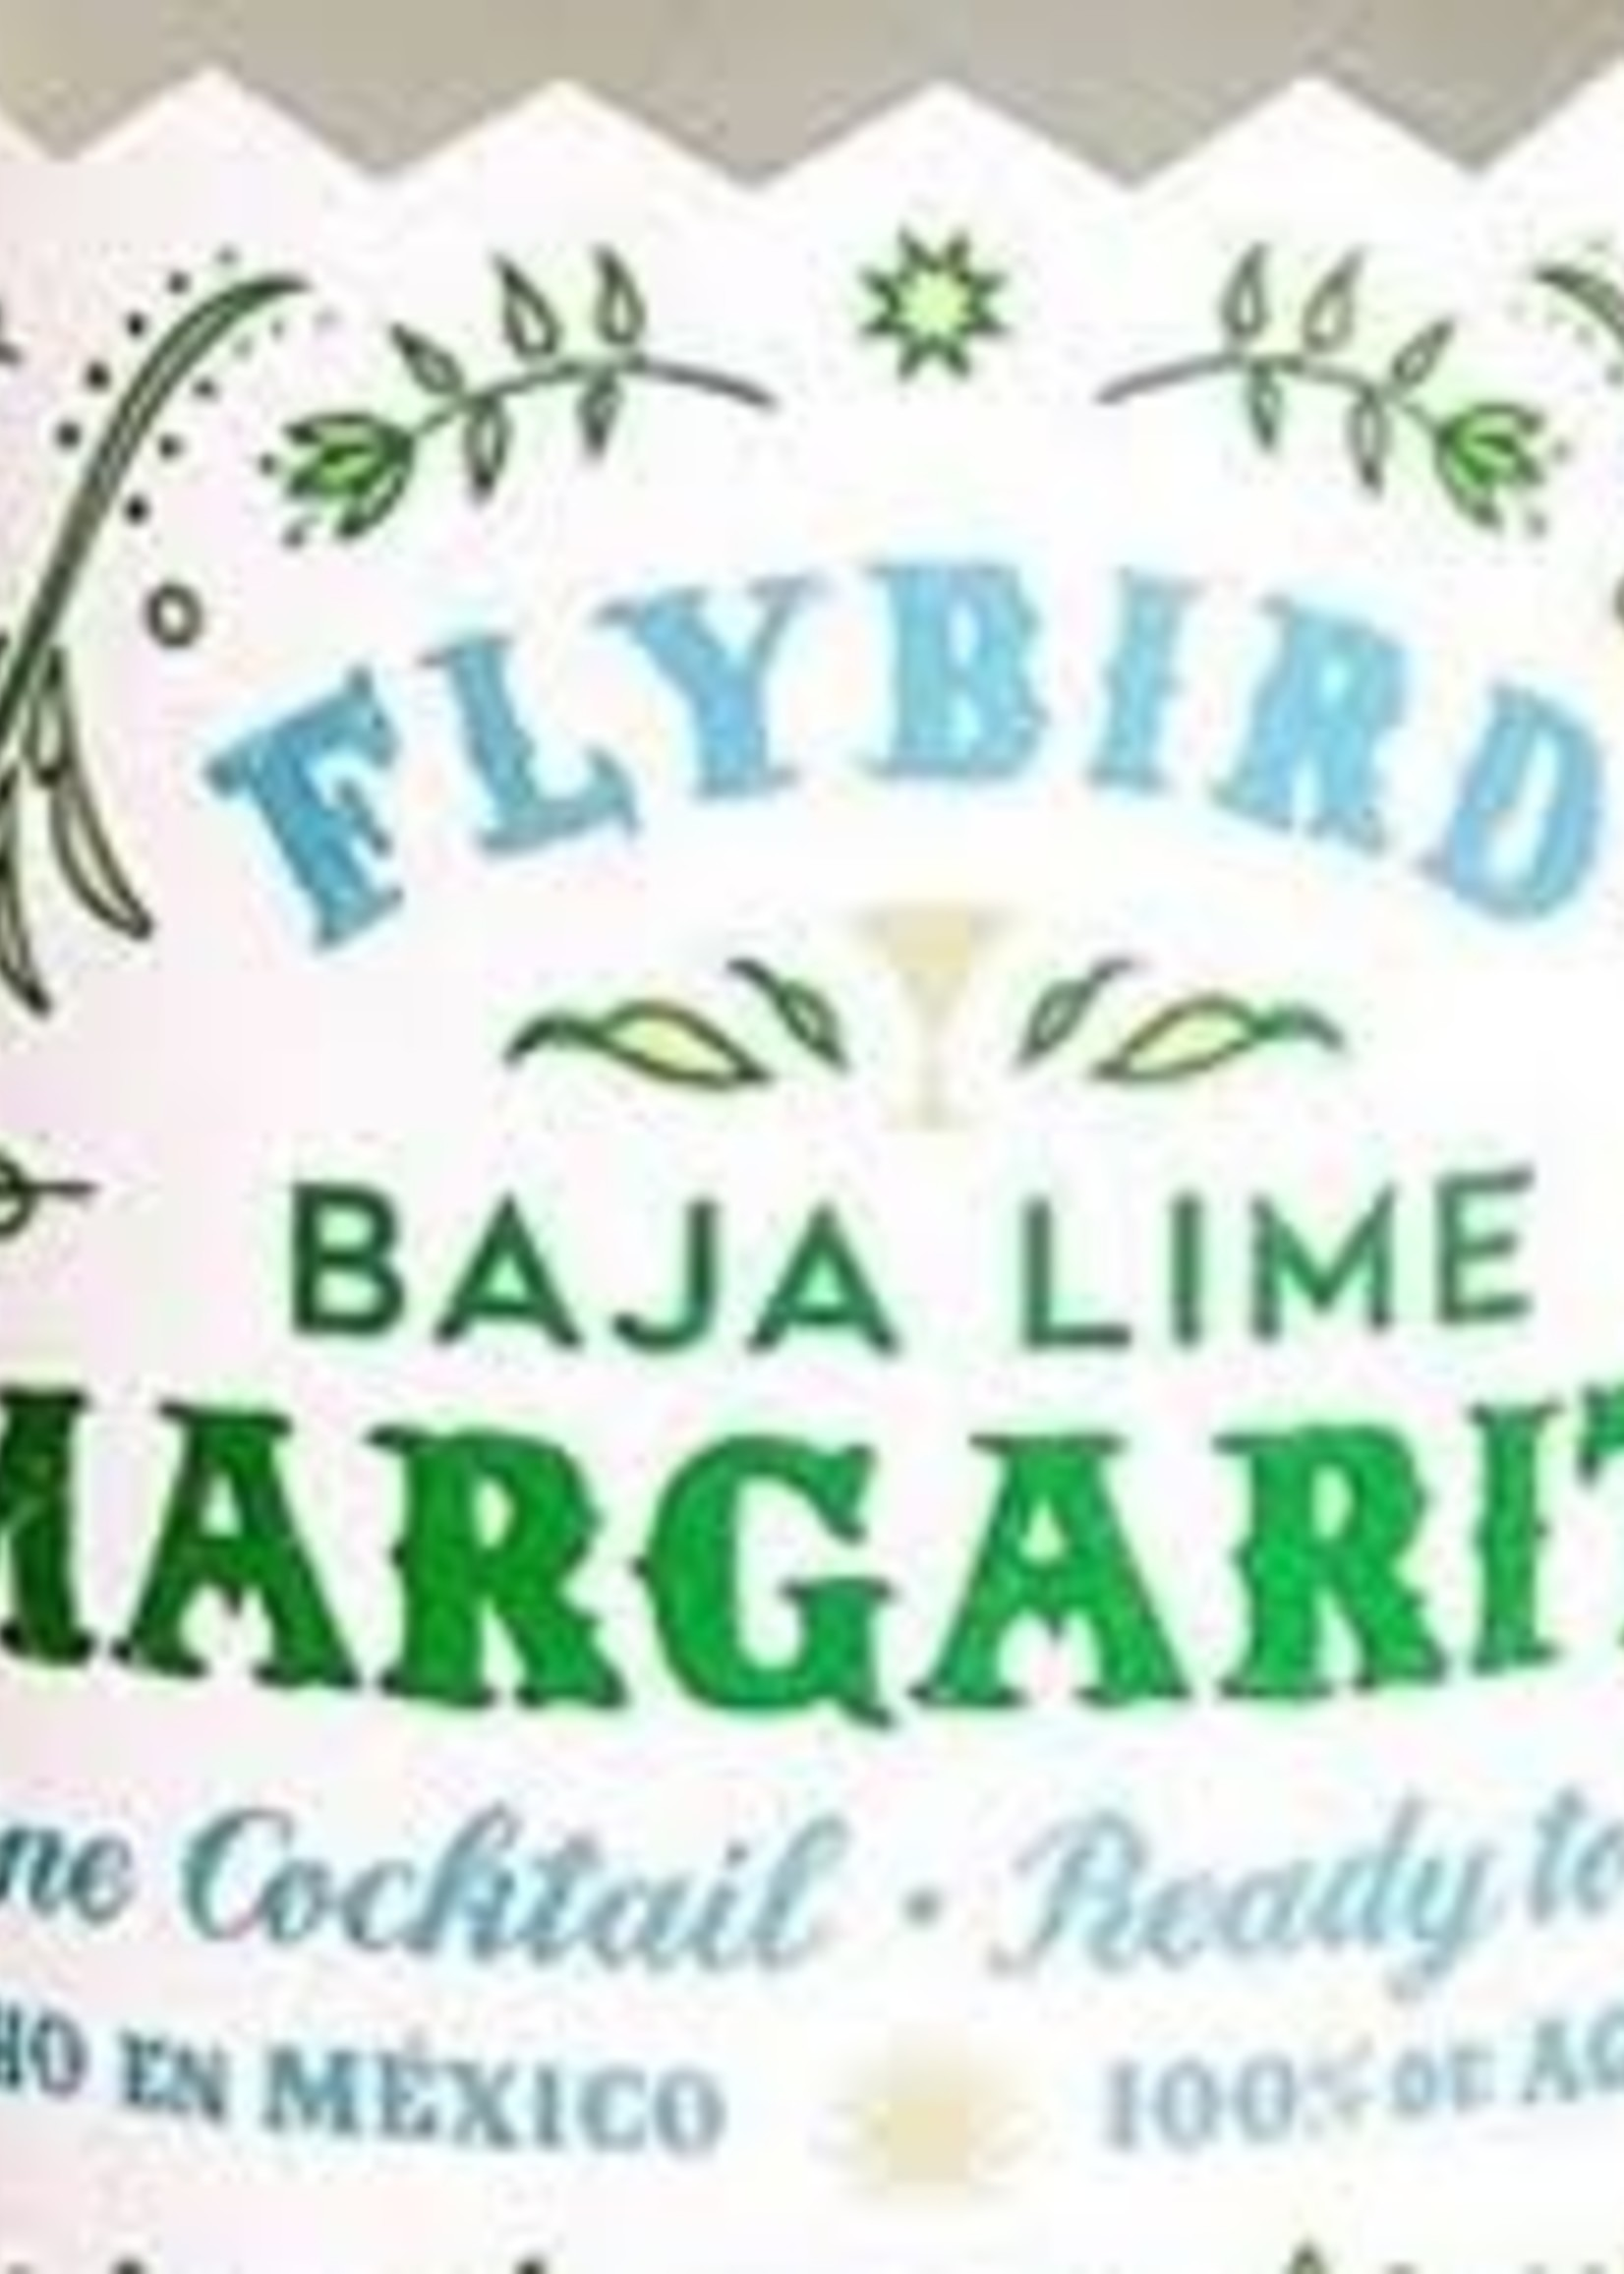 Flybird Baja Lime Margarita RTD